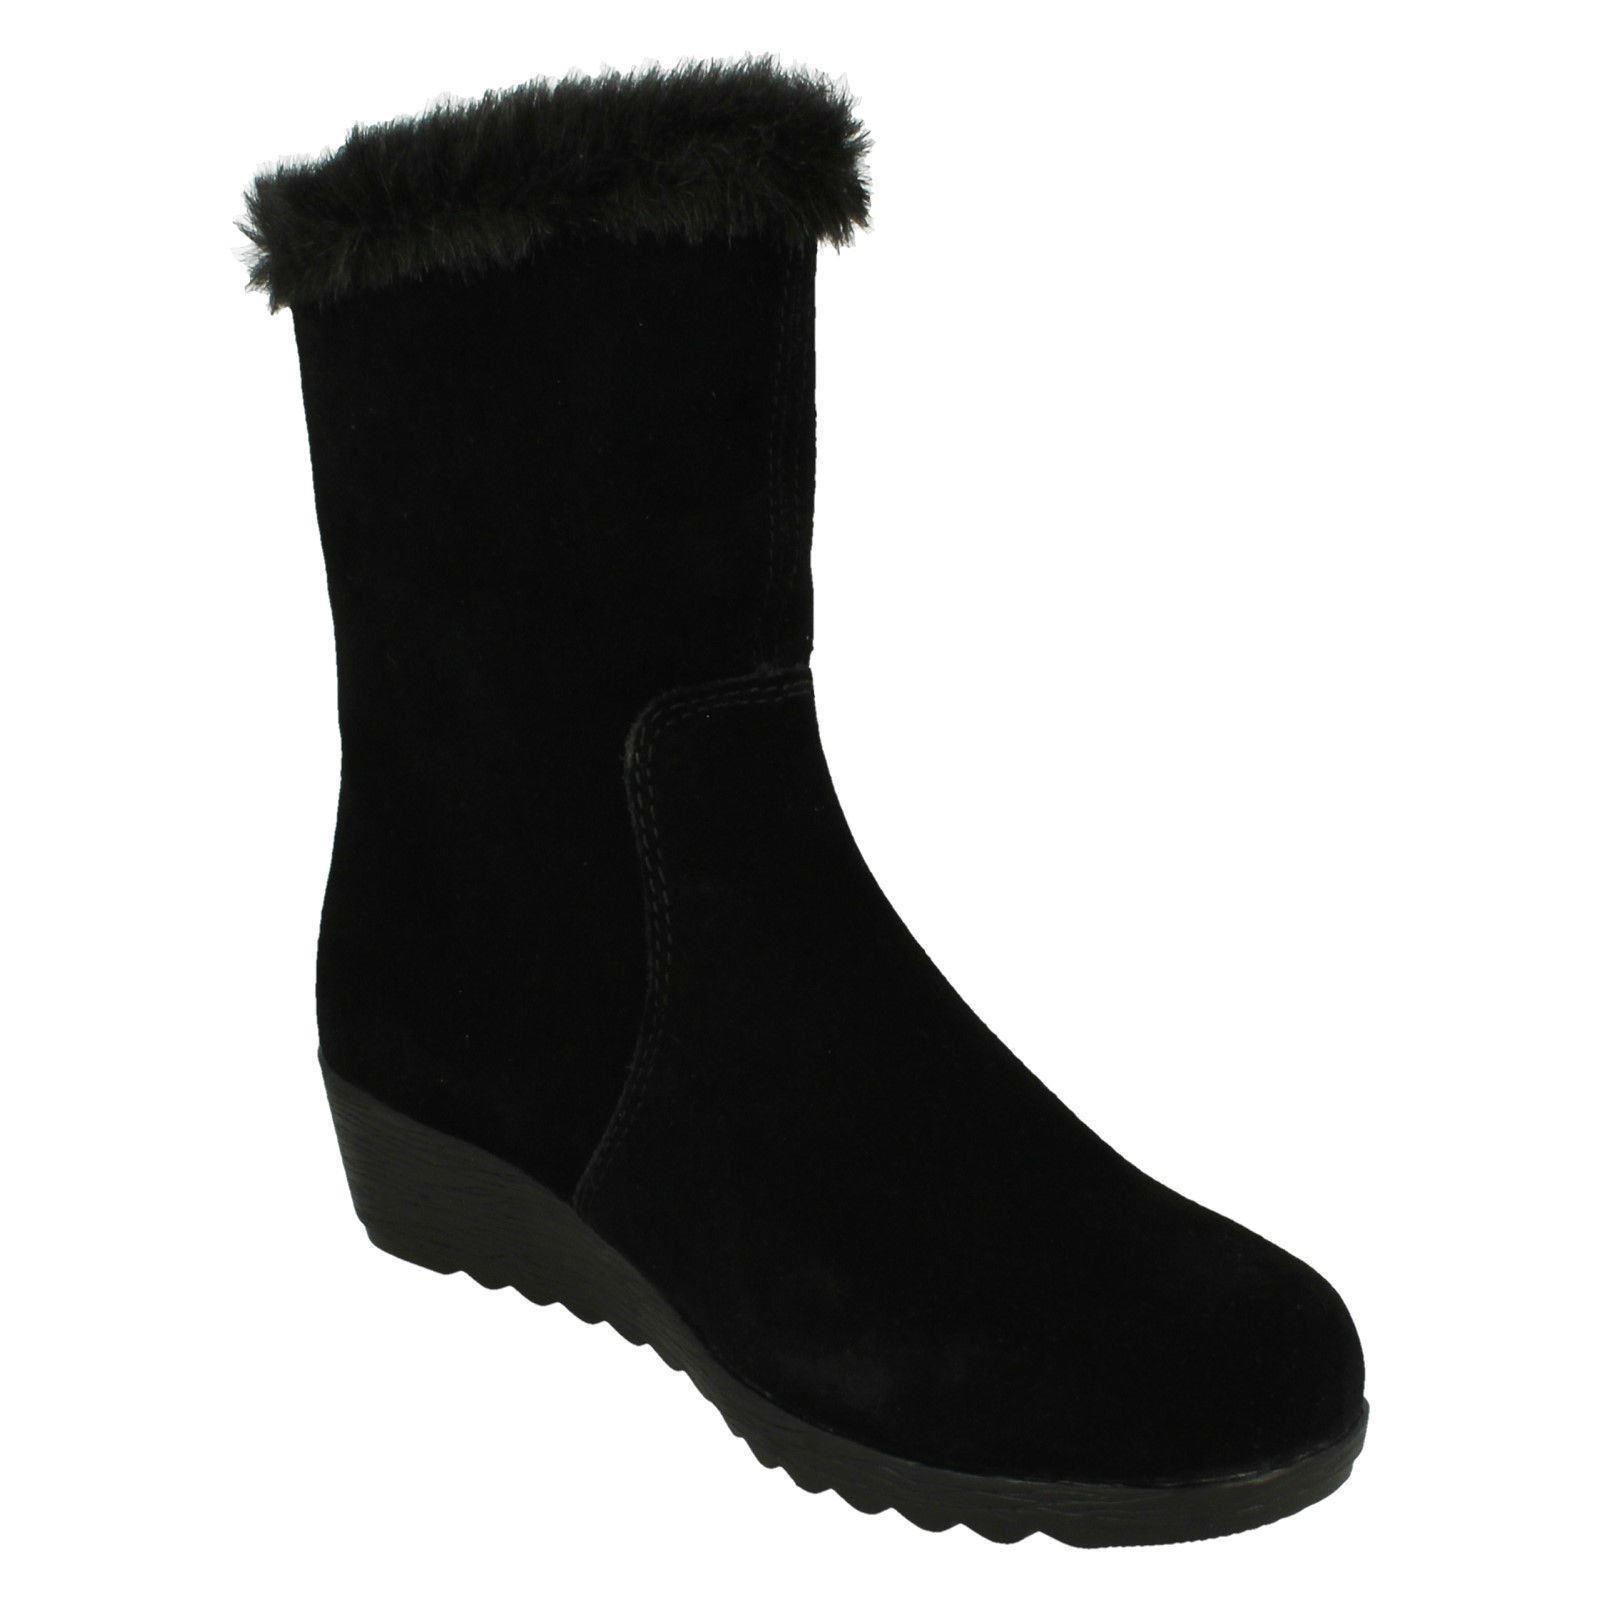 Damas Lana Rieker Lana Damas De Cordero Forrado botas al tobillo-Z2470 d6ebe7